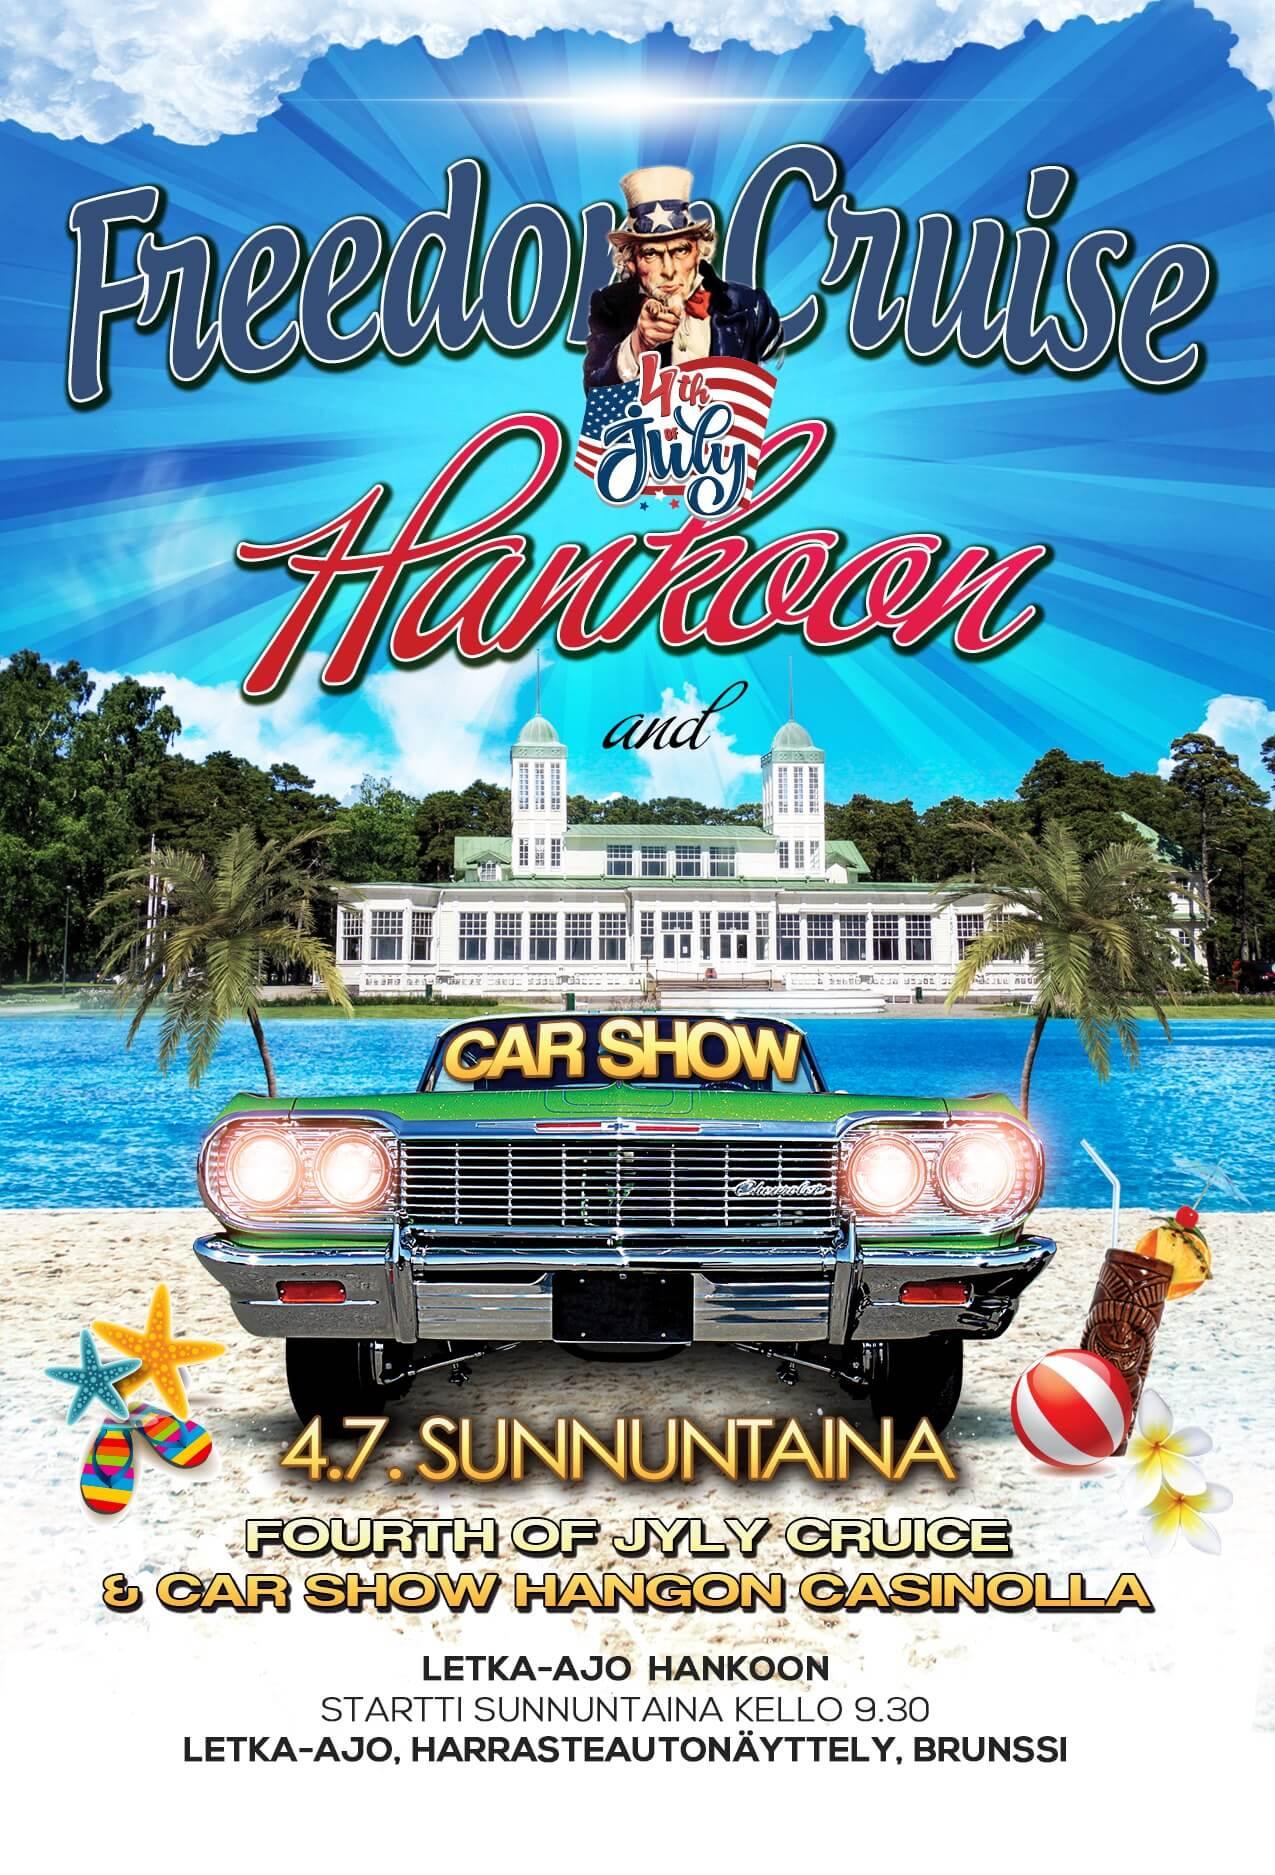 4th of July Freedom Cruise Hanko mainos